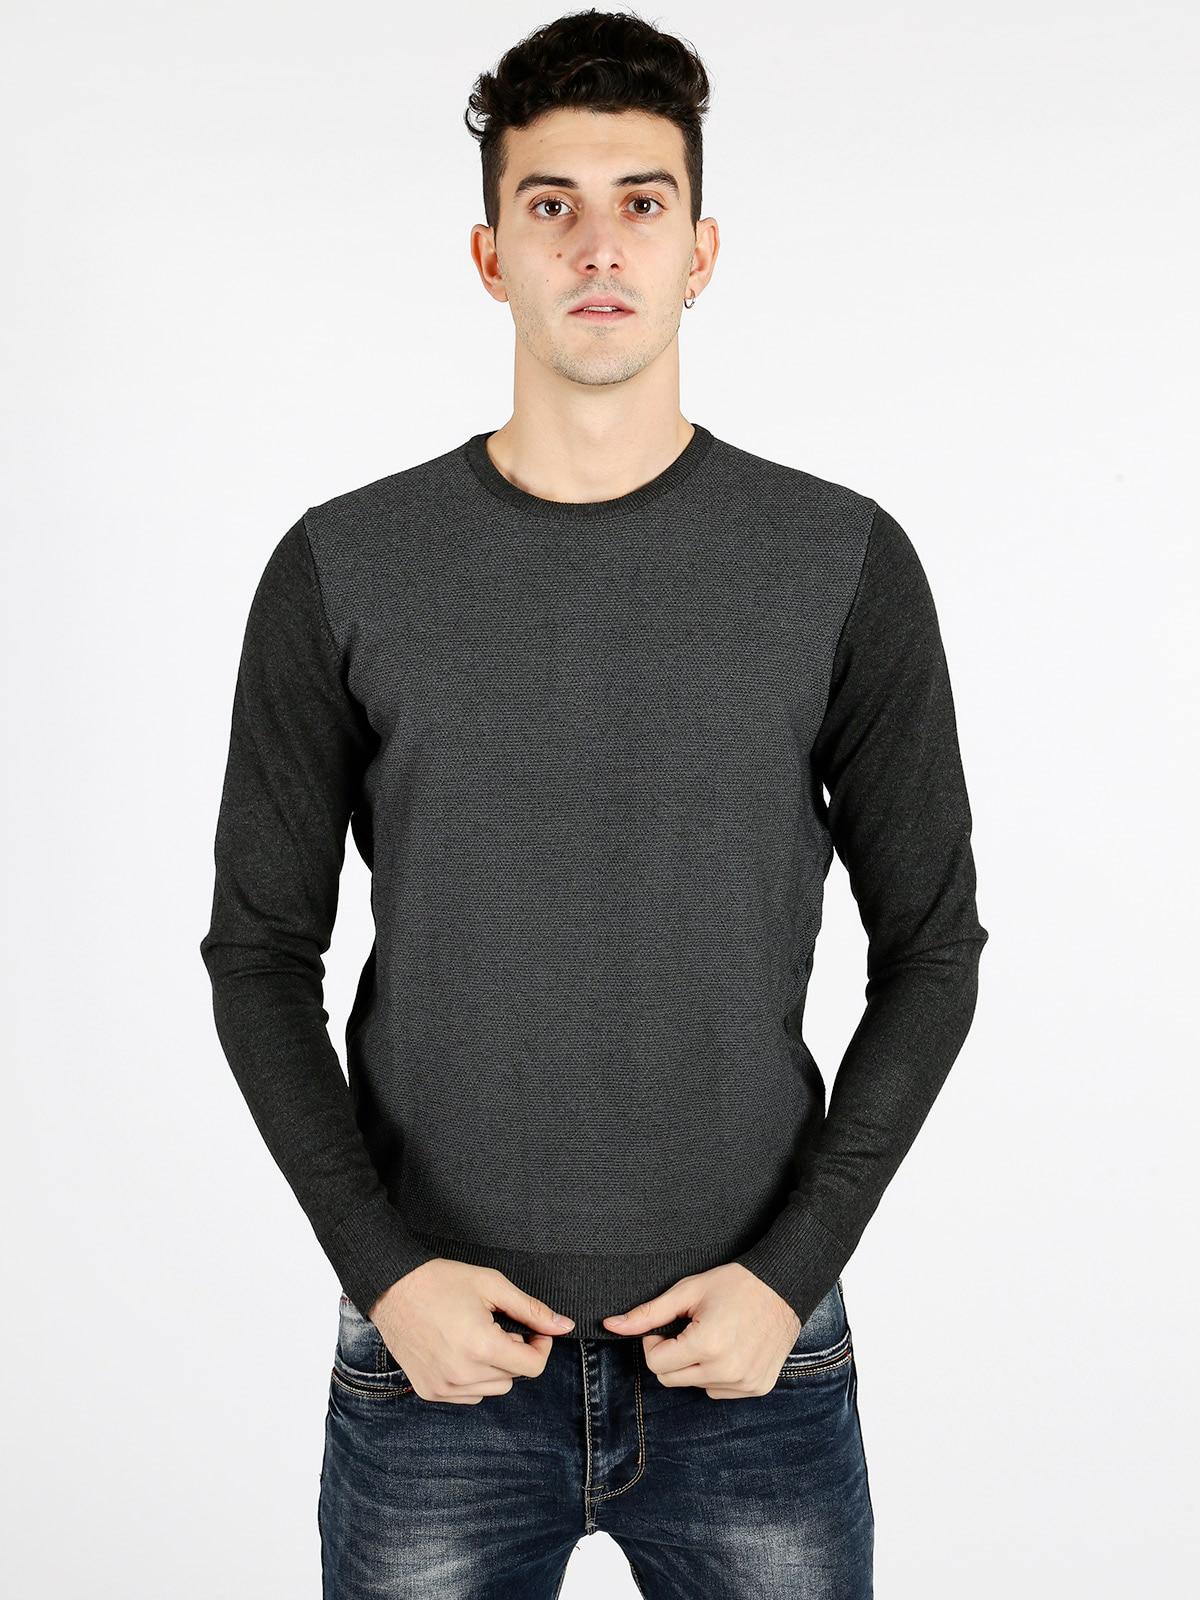 Sweater Men's Heather